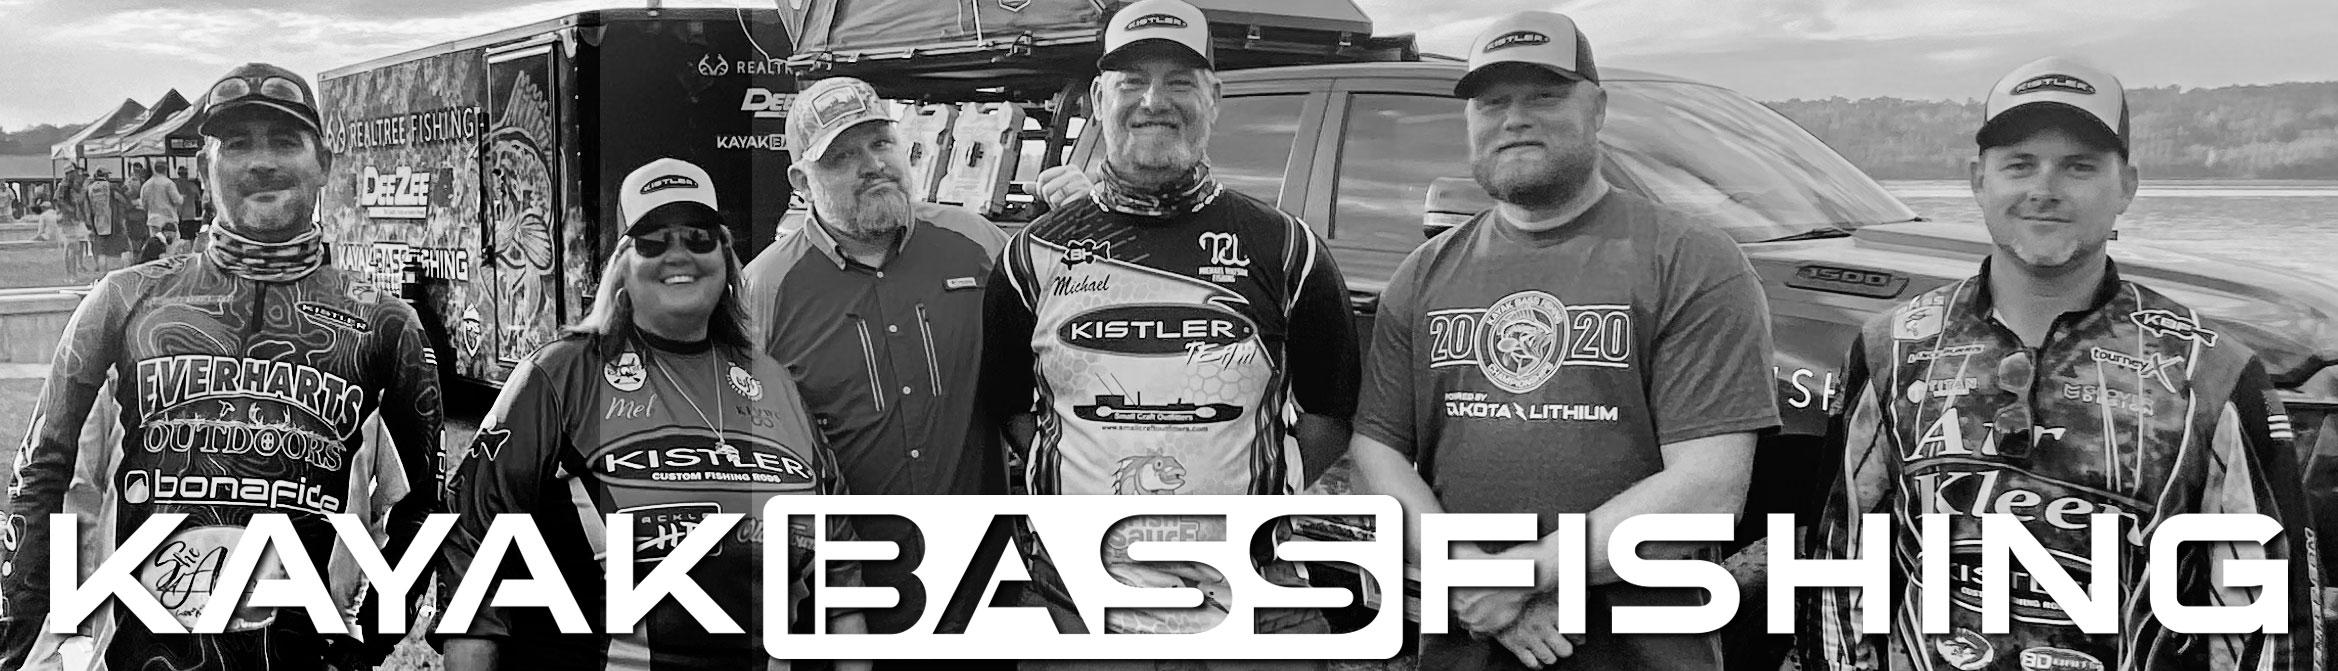 KBF Kayak Bass Fishing Community